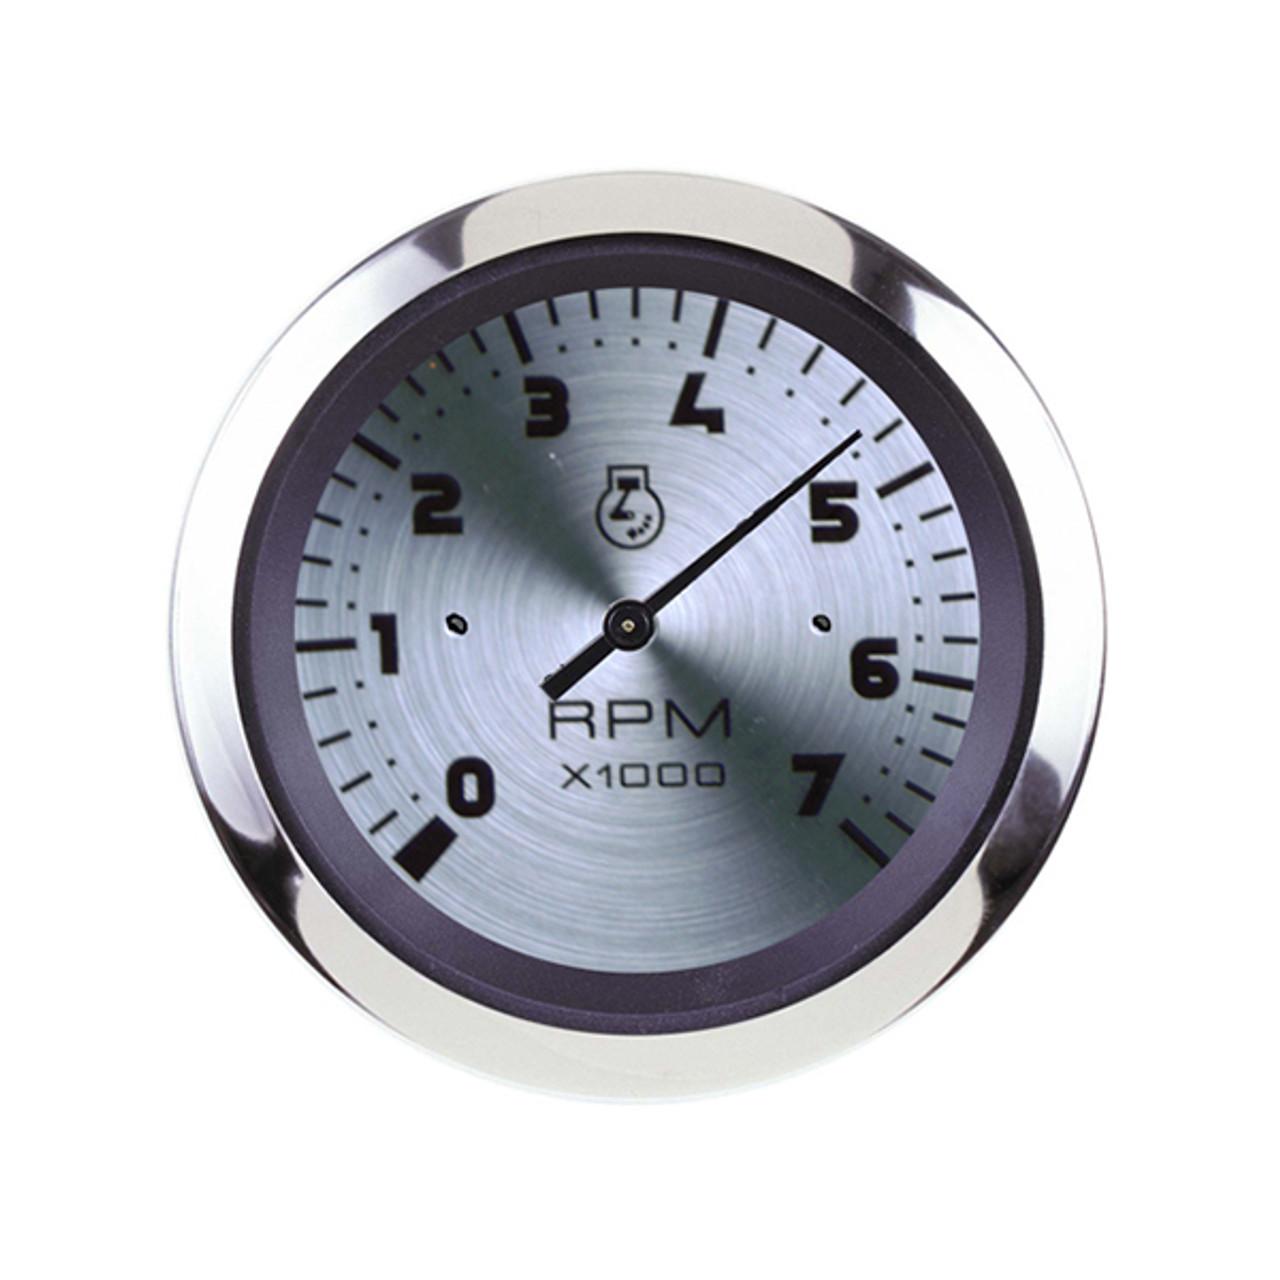 3 Sierra International 65693P Lido 0-7000 Rpm Dial Range Electric Tachometer for O//B /& 4-Stroke Gas Engines